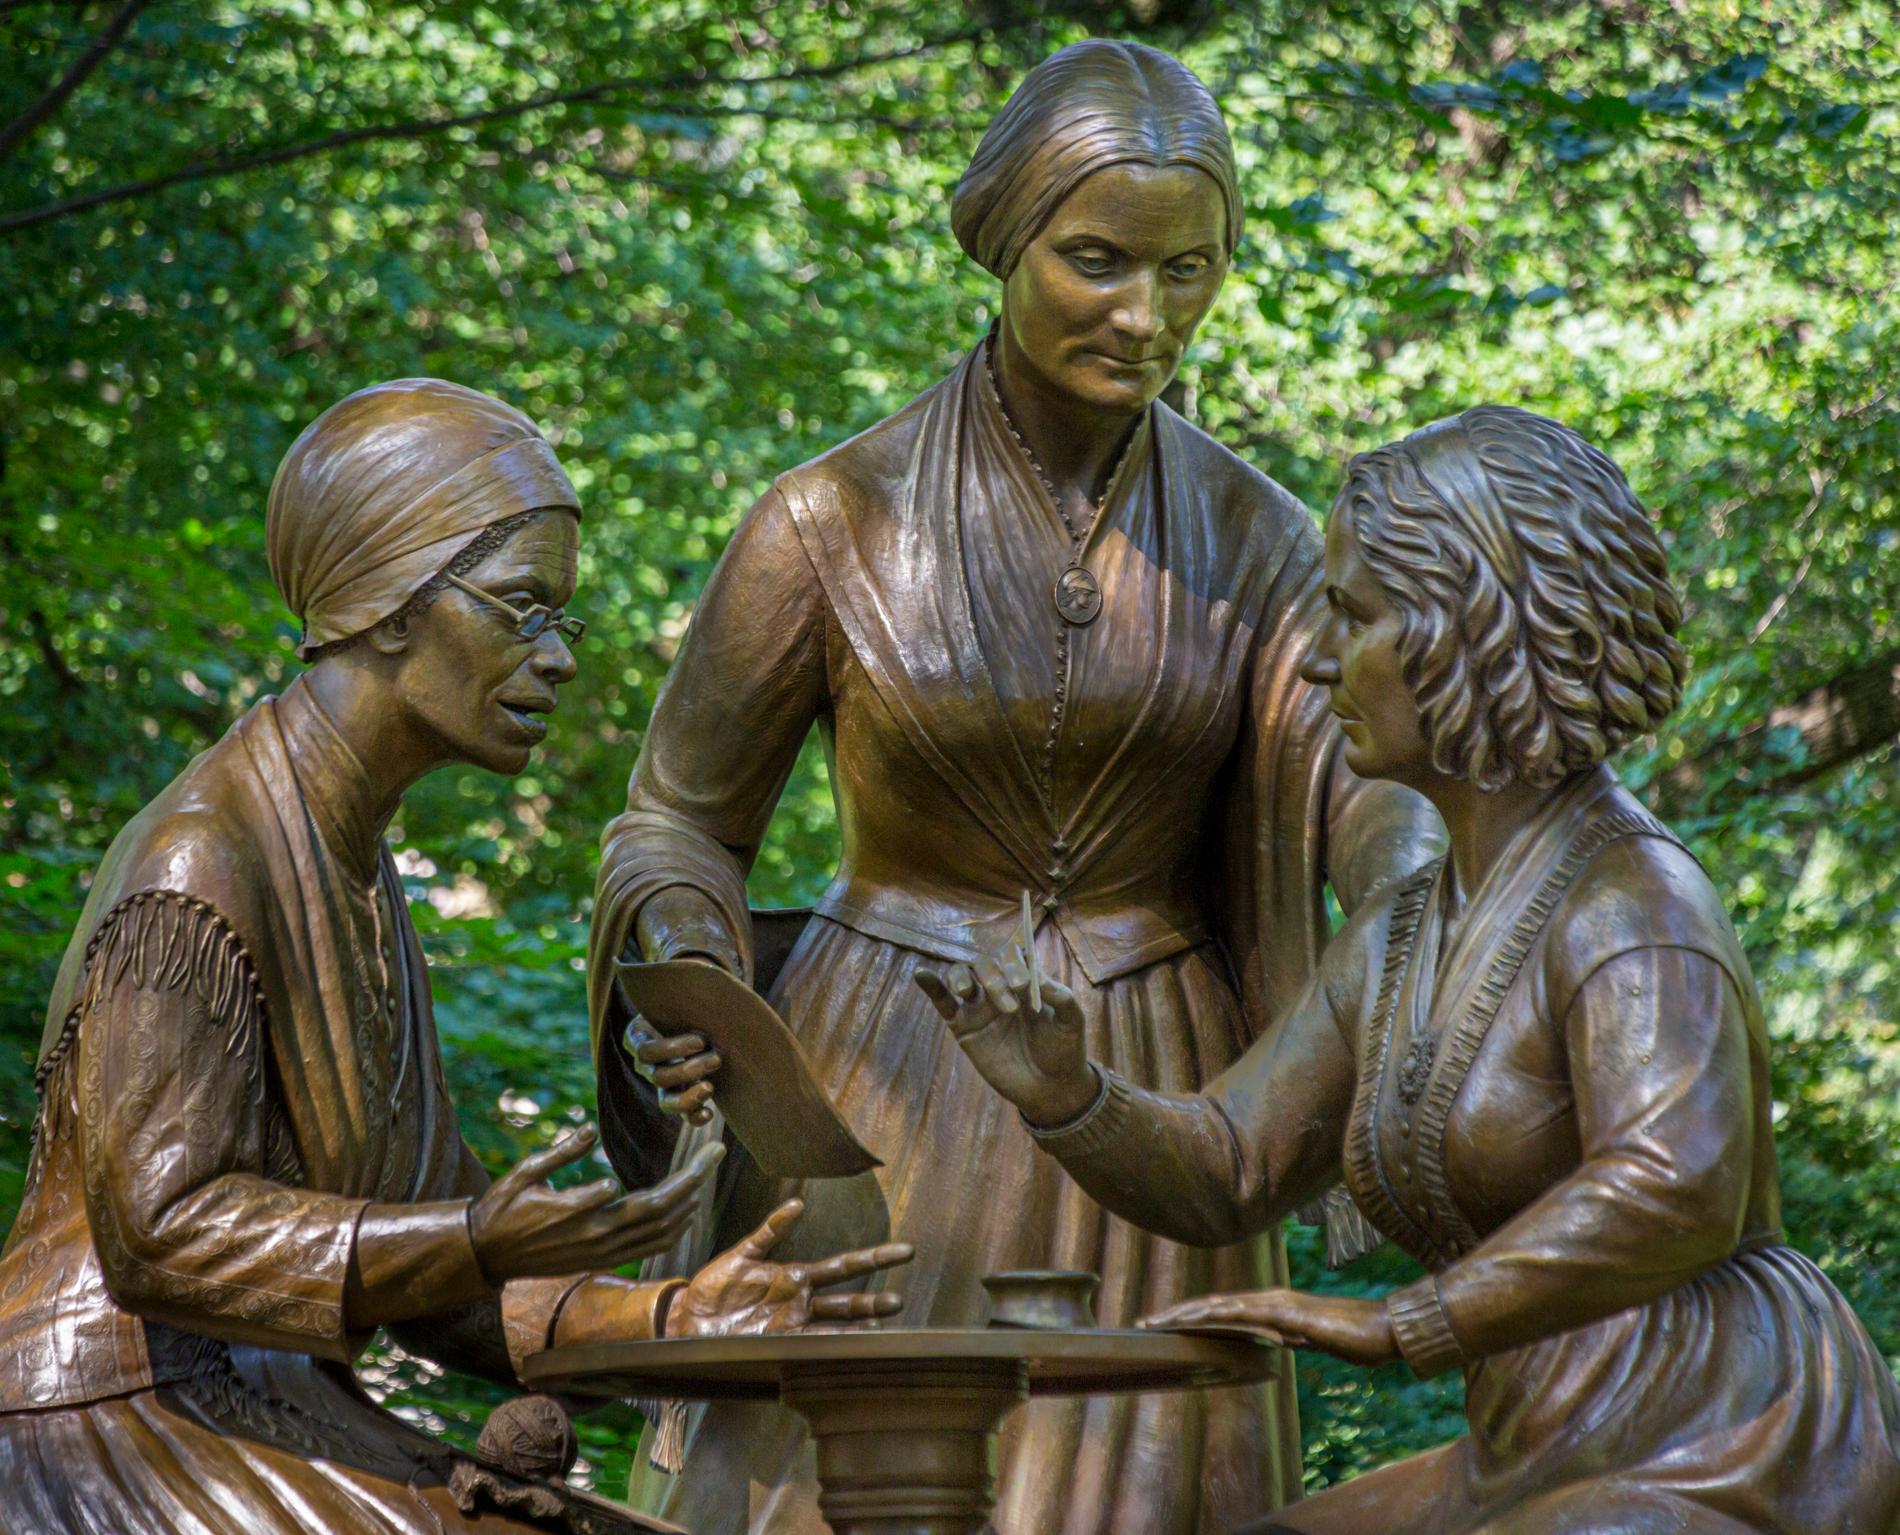 Women's rights pioneers [6702]